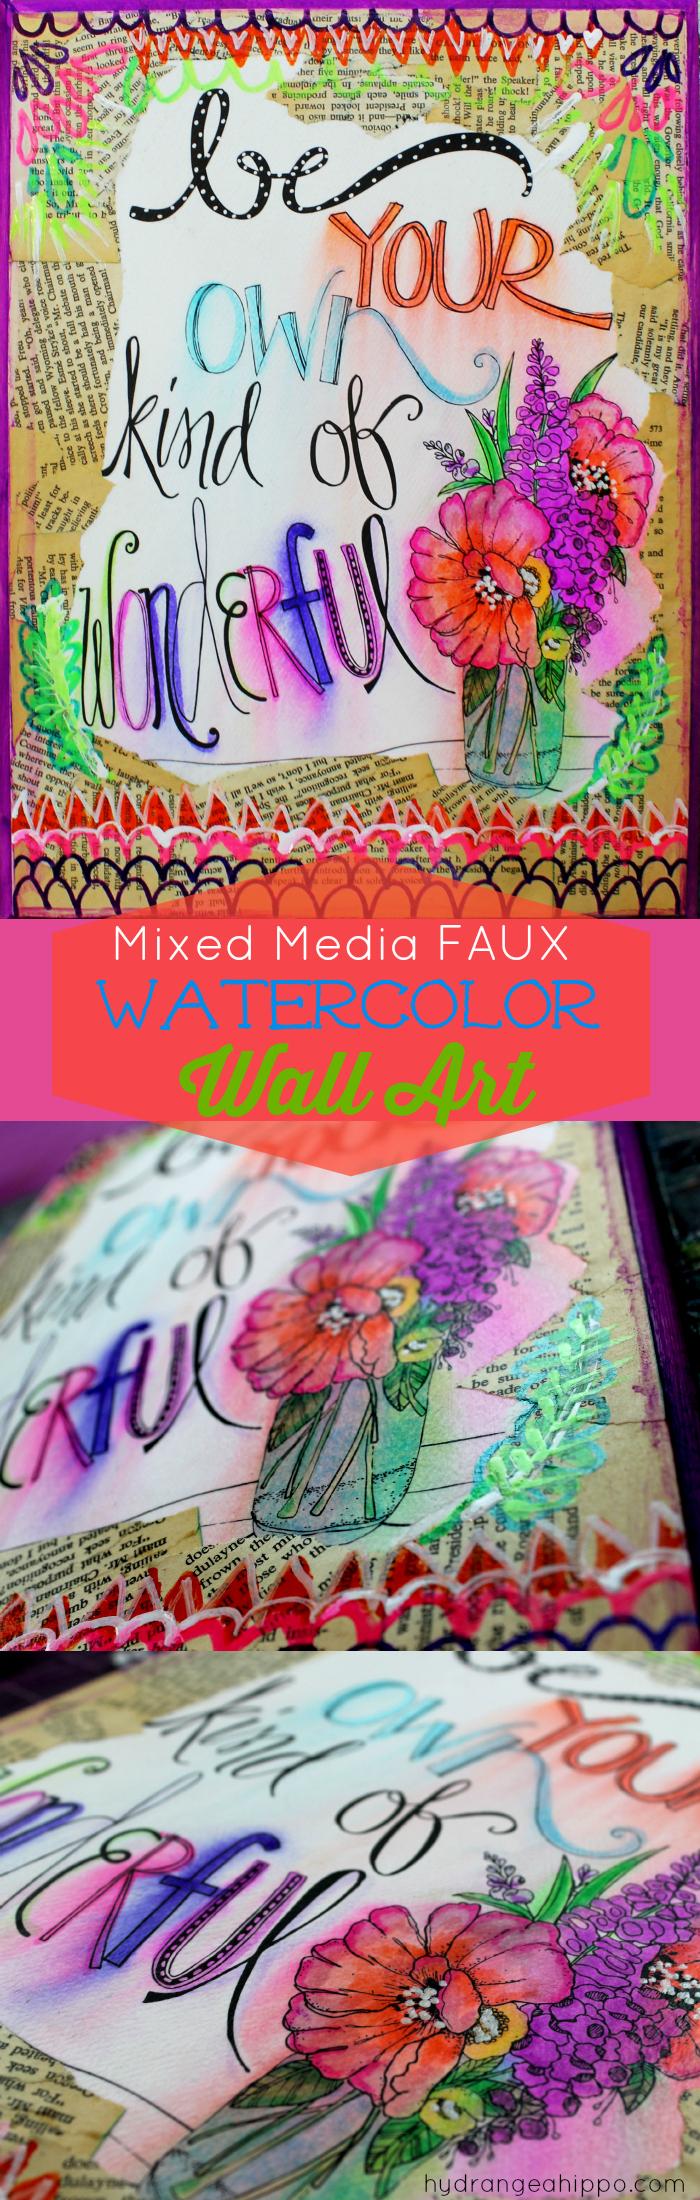 Mixed Media Faux Watercolor Wall Art by Jennifer Priest